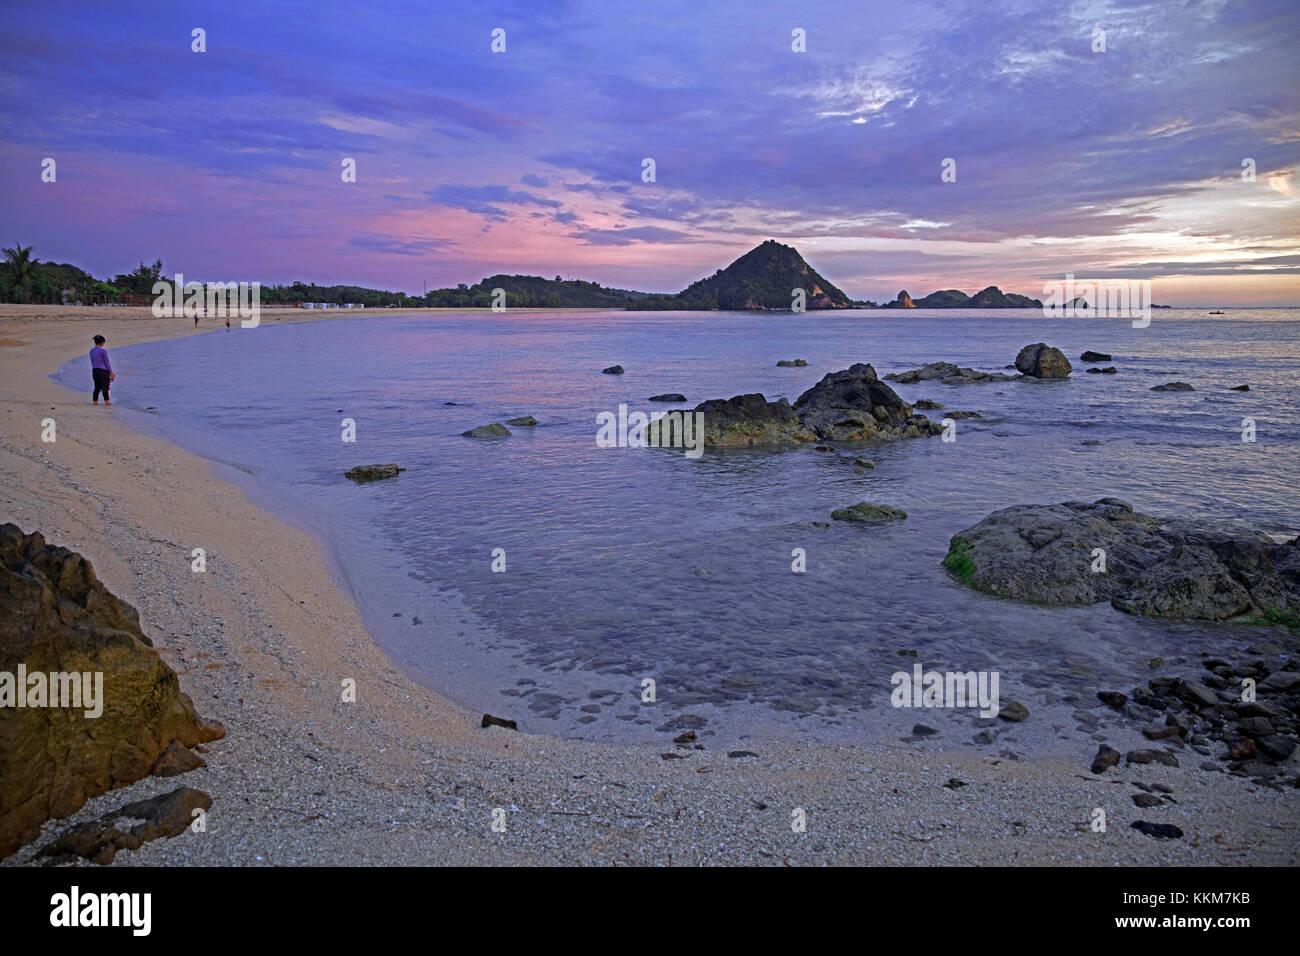 Los turistas en la playa de Kuta al atardecer en la isla de Lombok, Lesser Sunda Islands, indonesia Imagen De Stock